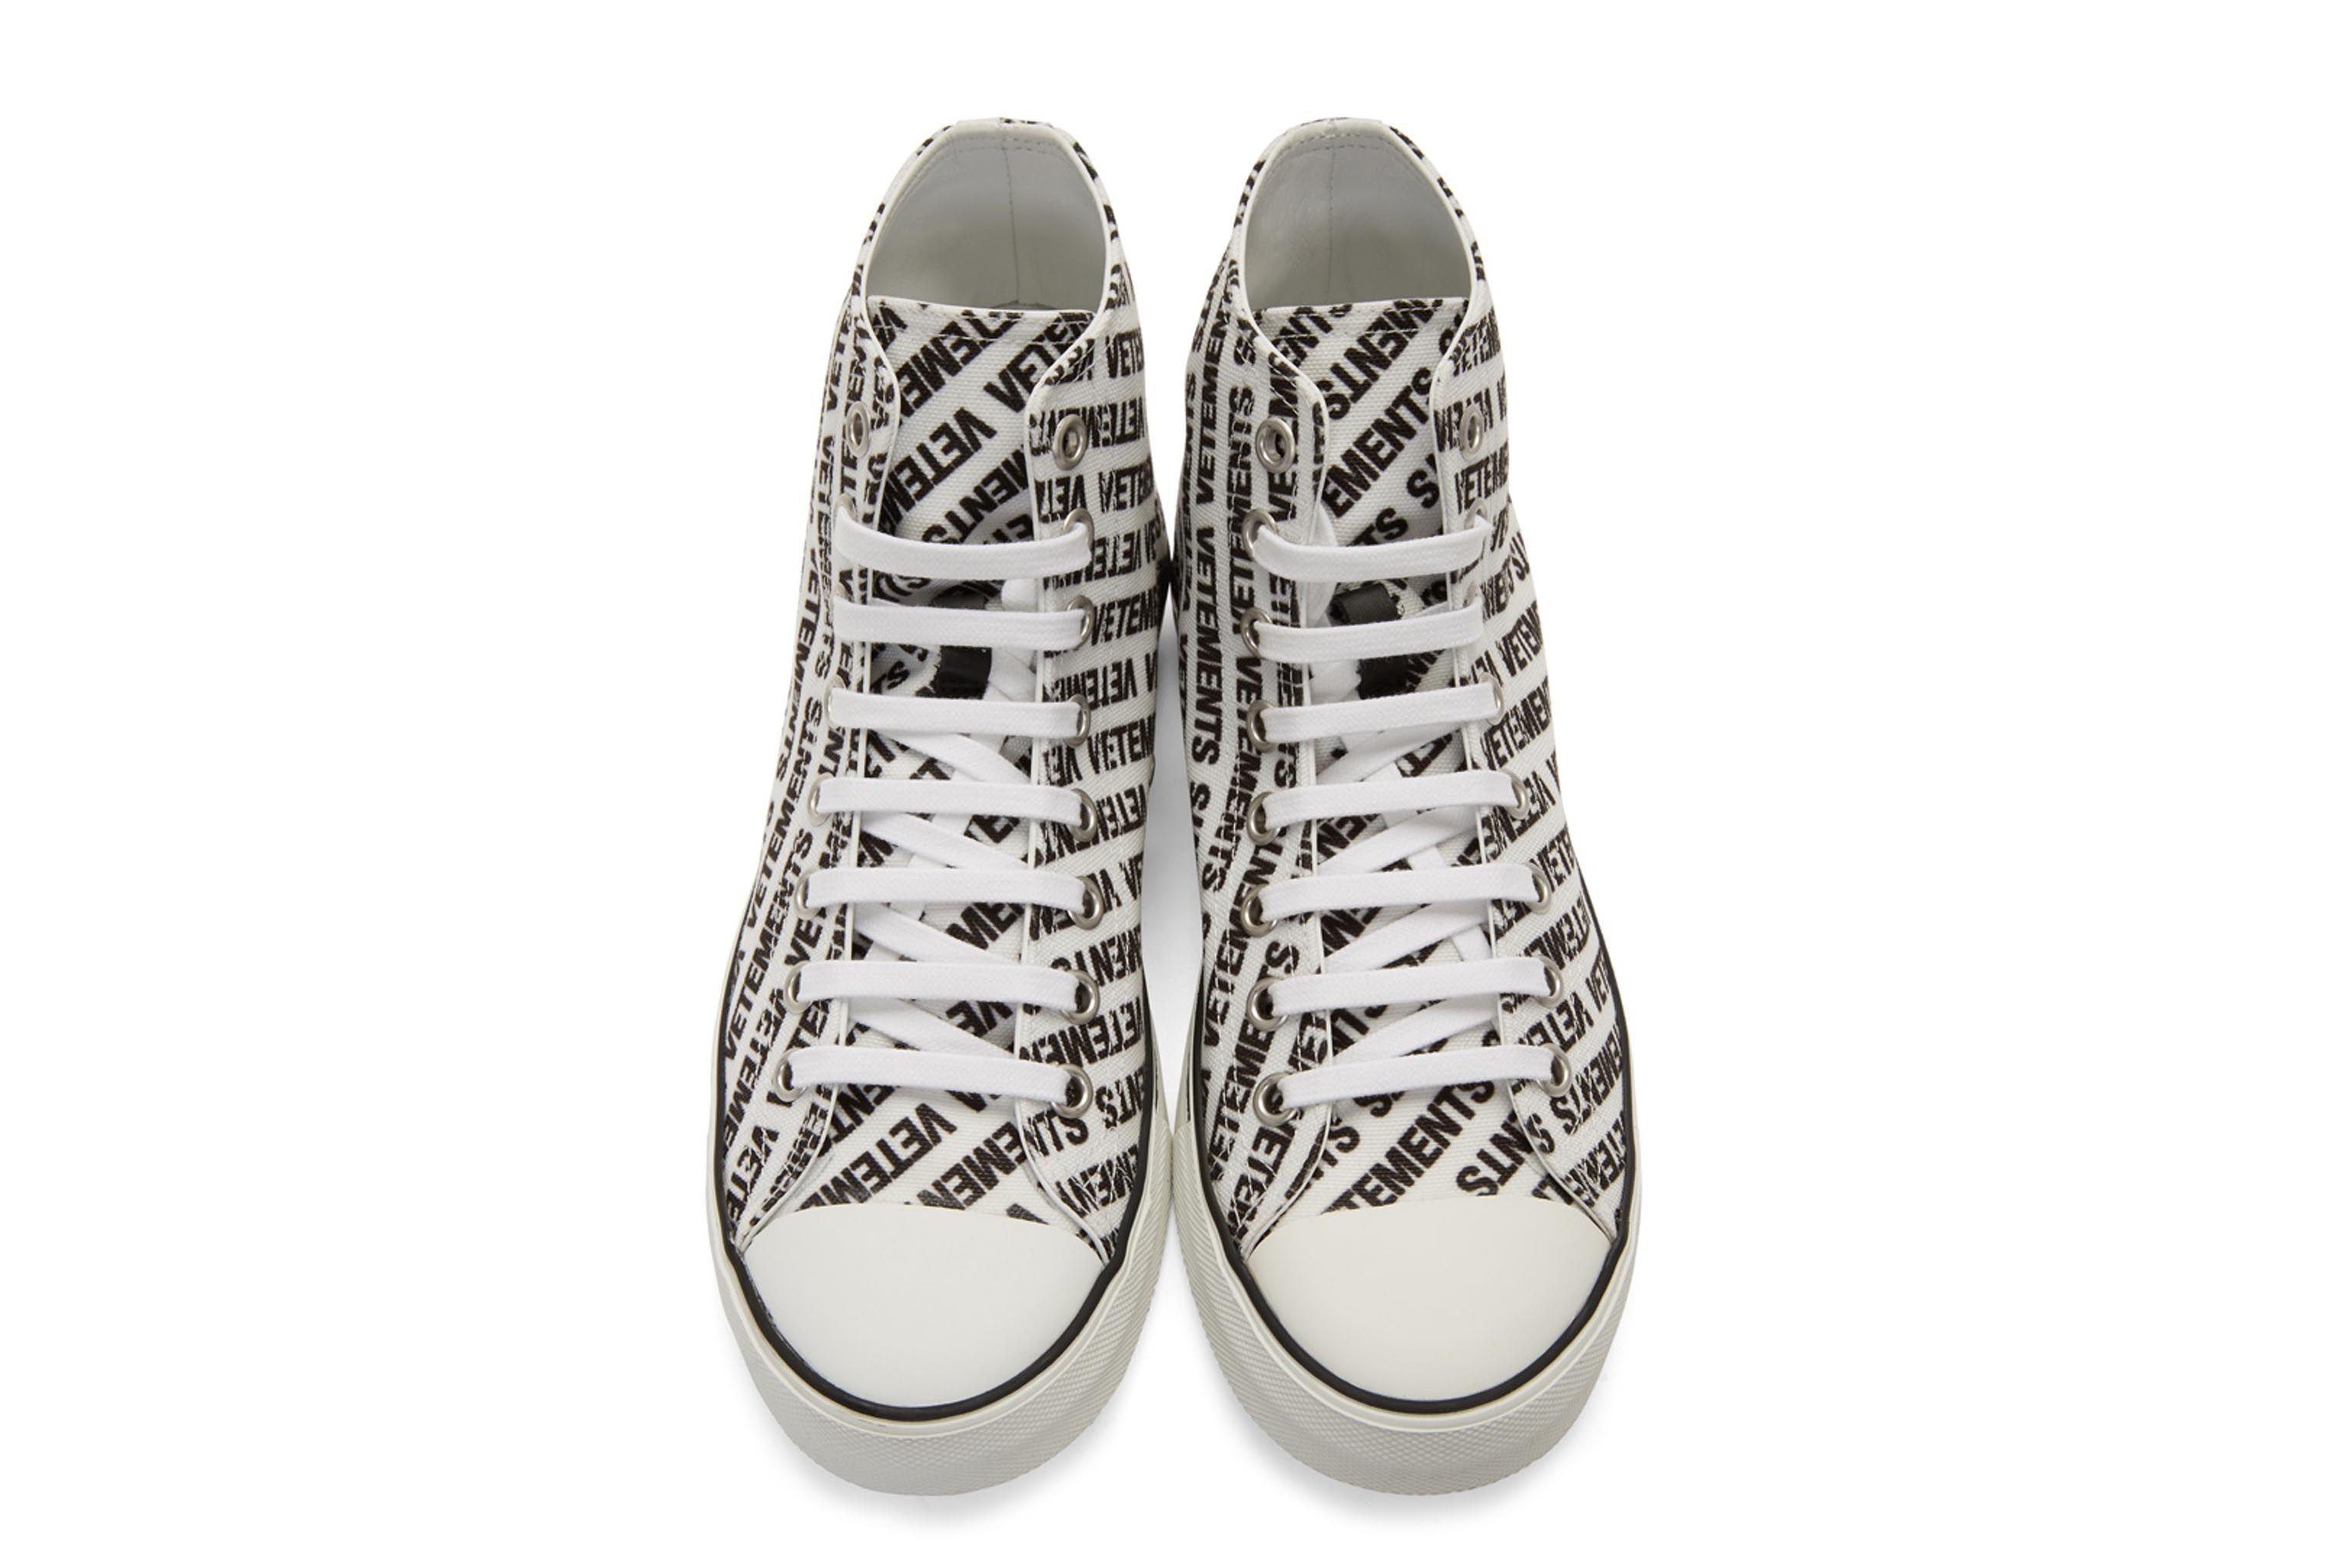 Vetements Logo High Top Sneakers Black White 5 Sneaker Freaker